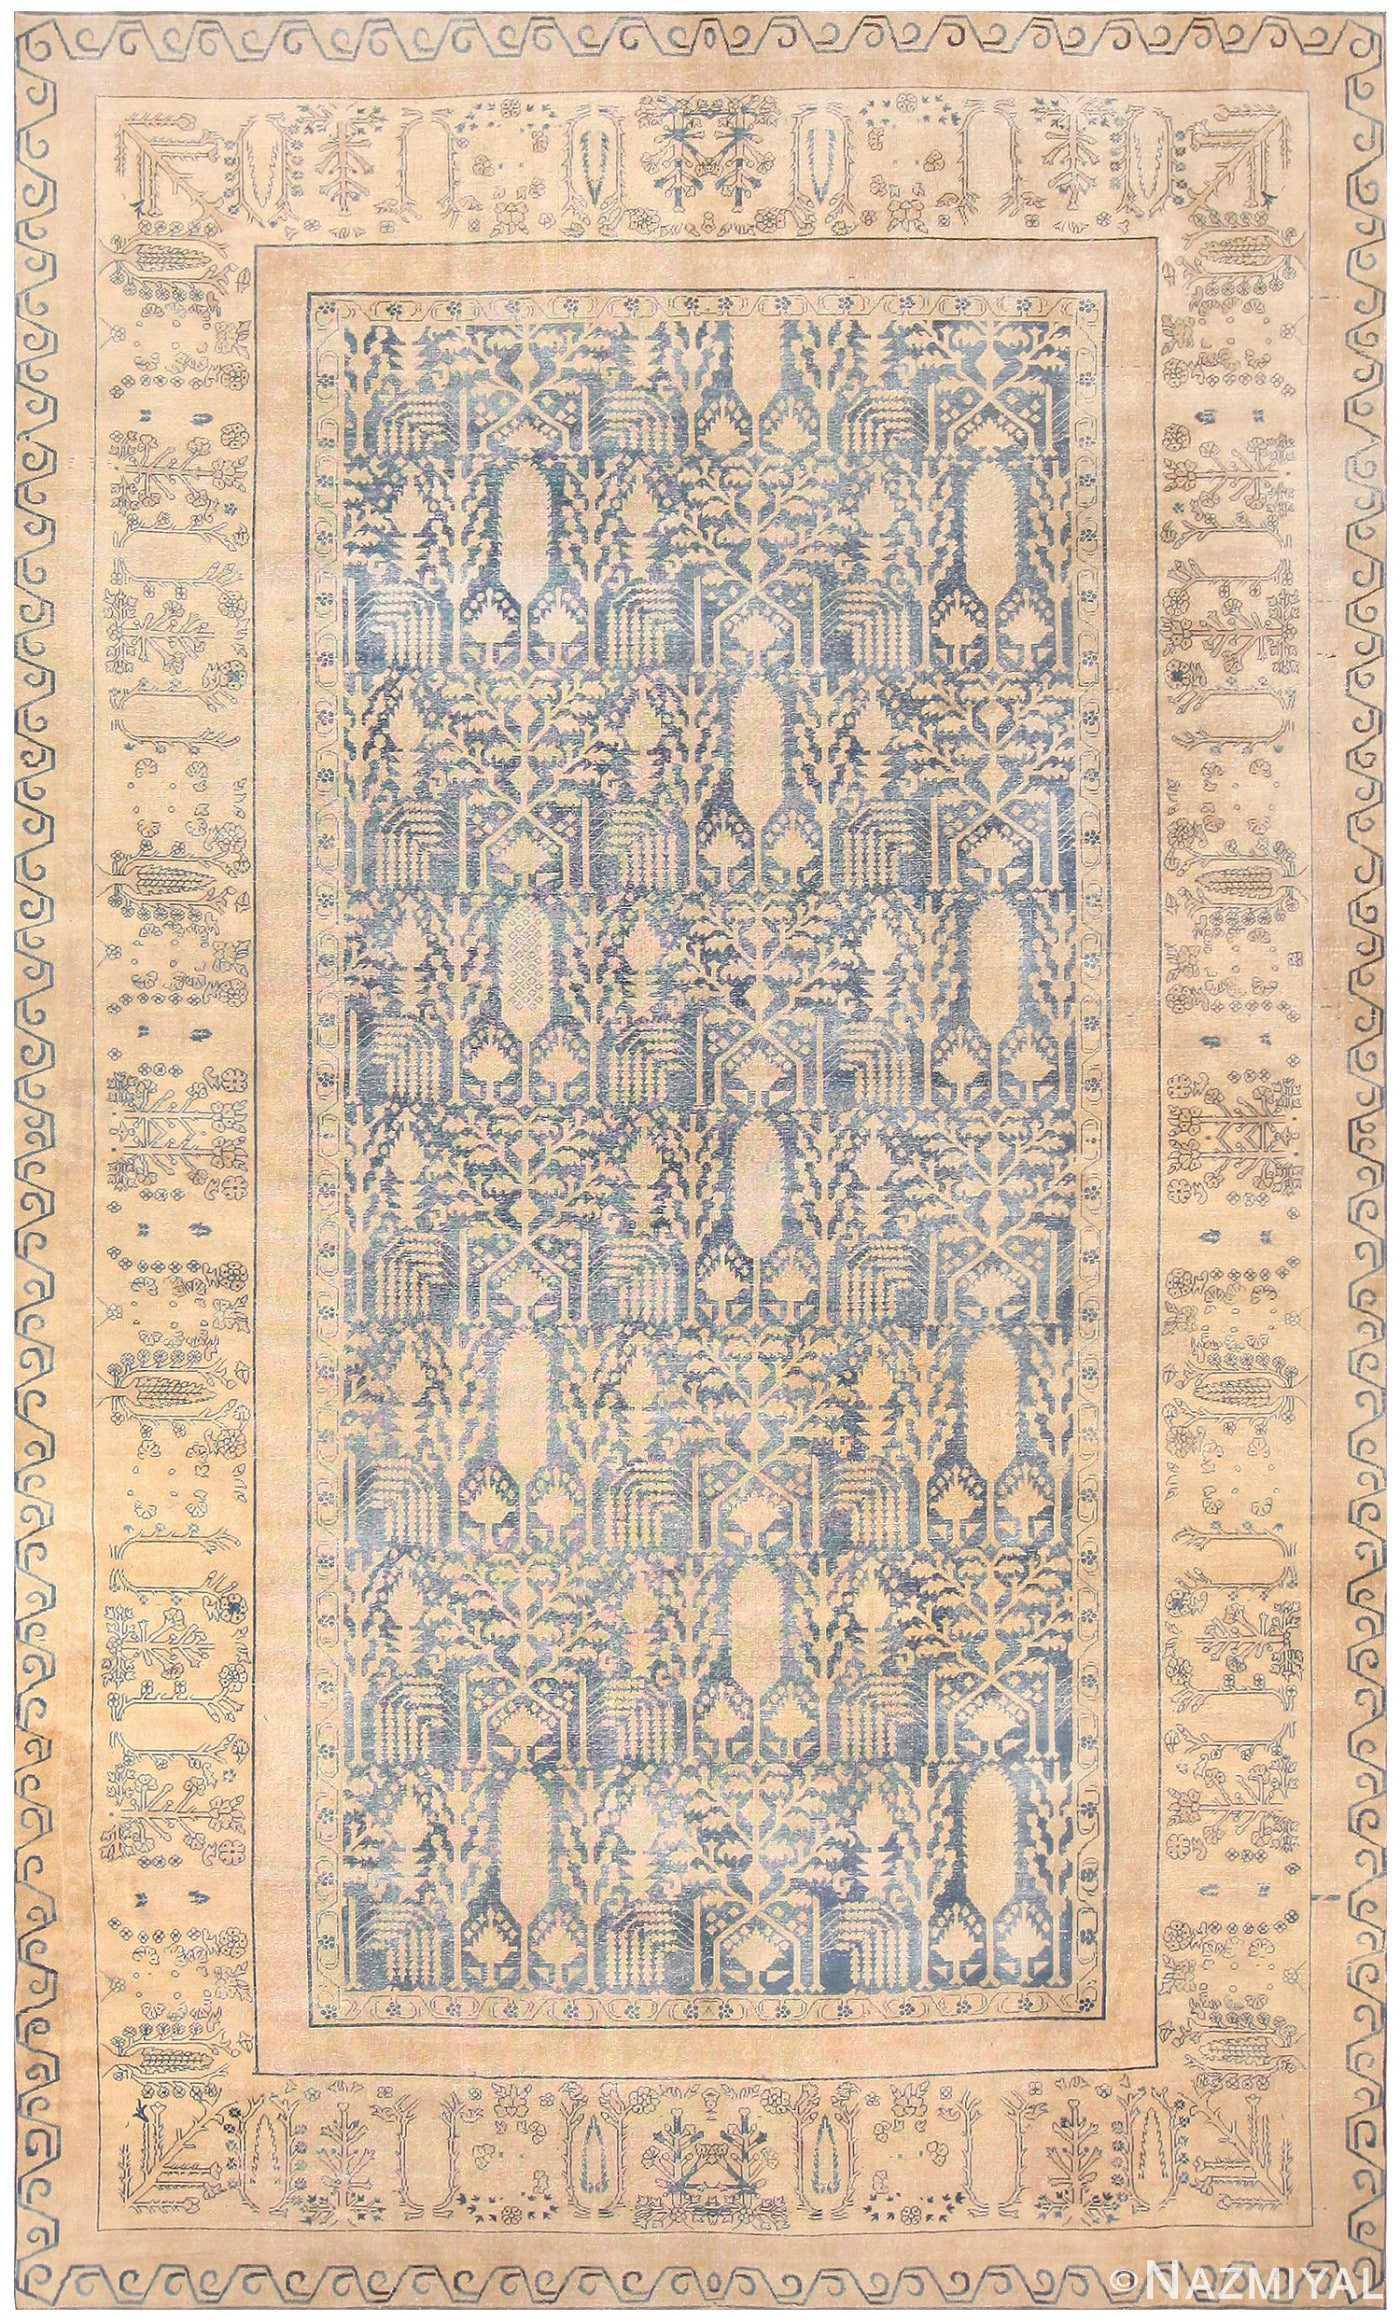 Large Antique Indian Carpet 48301 Detail/Large View